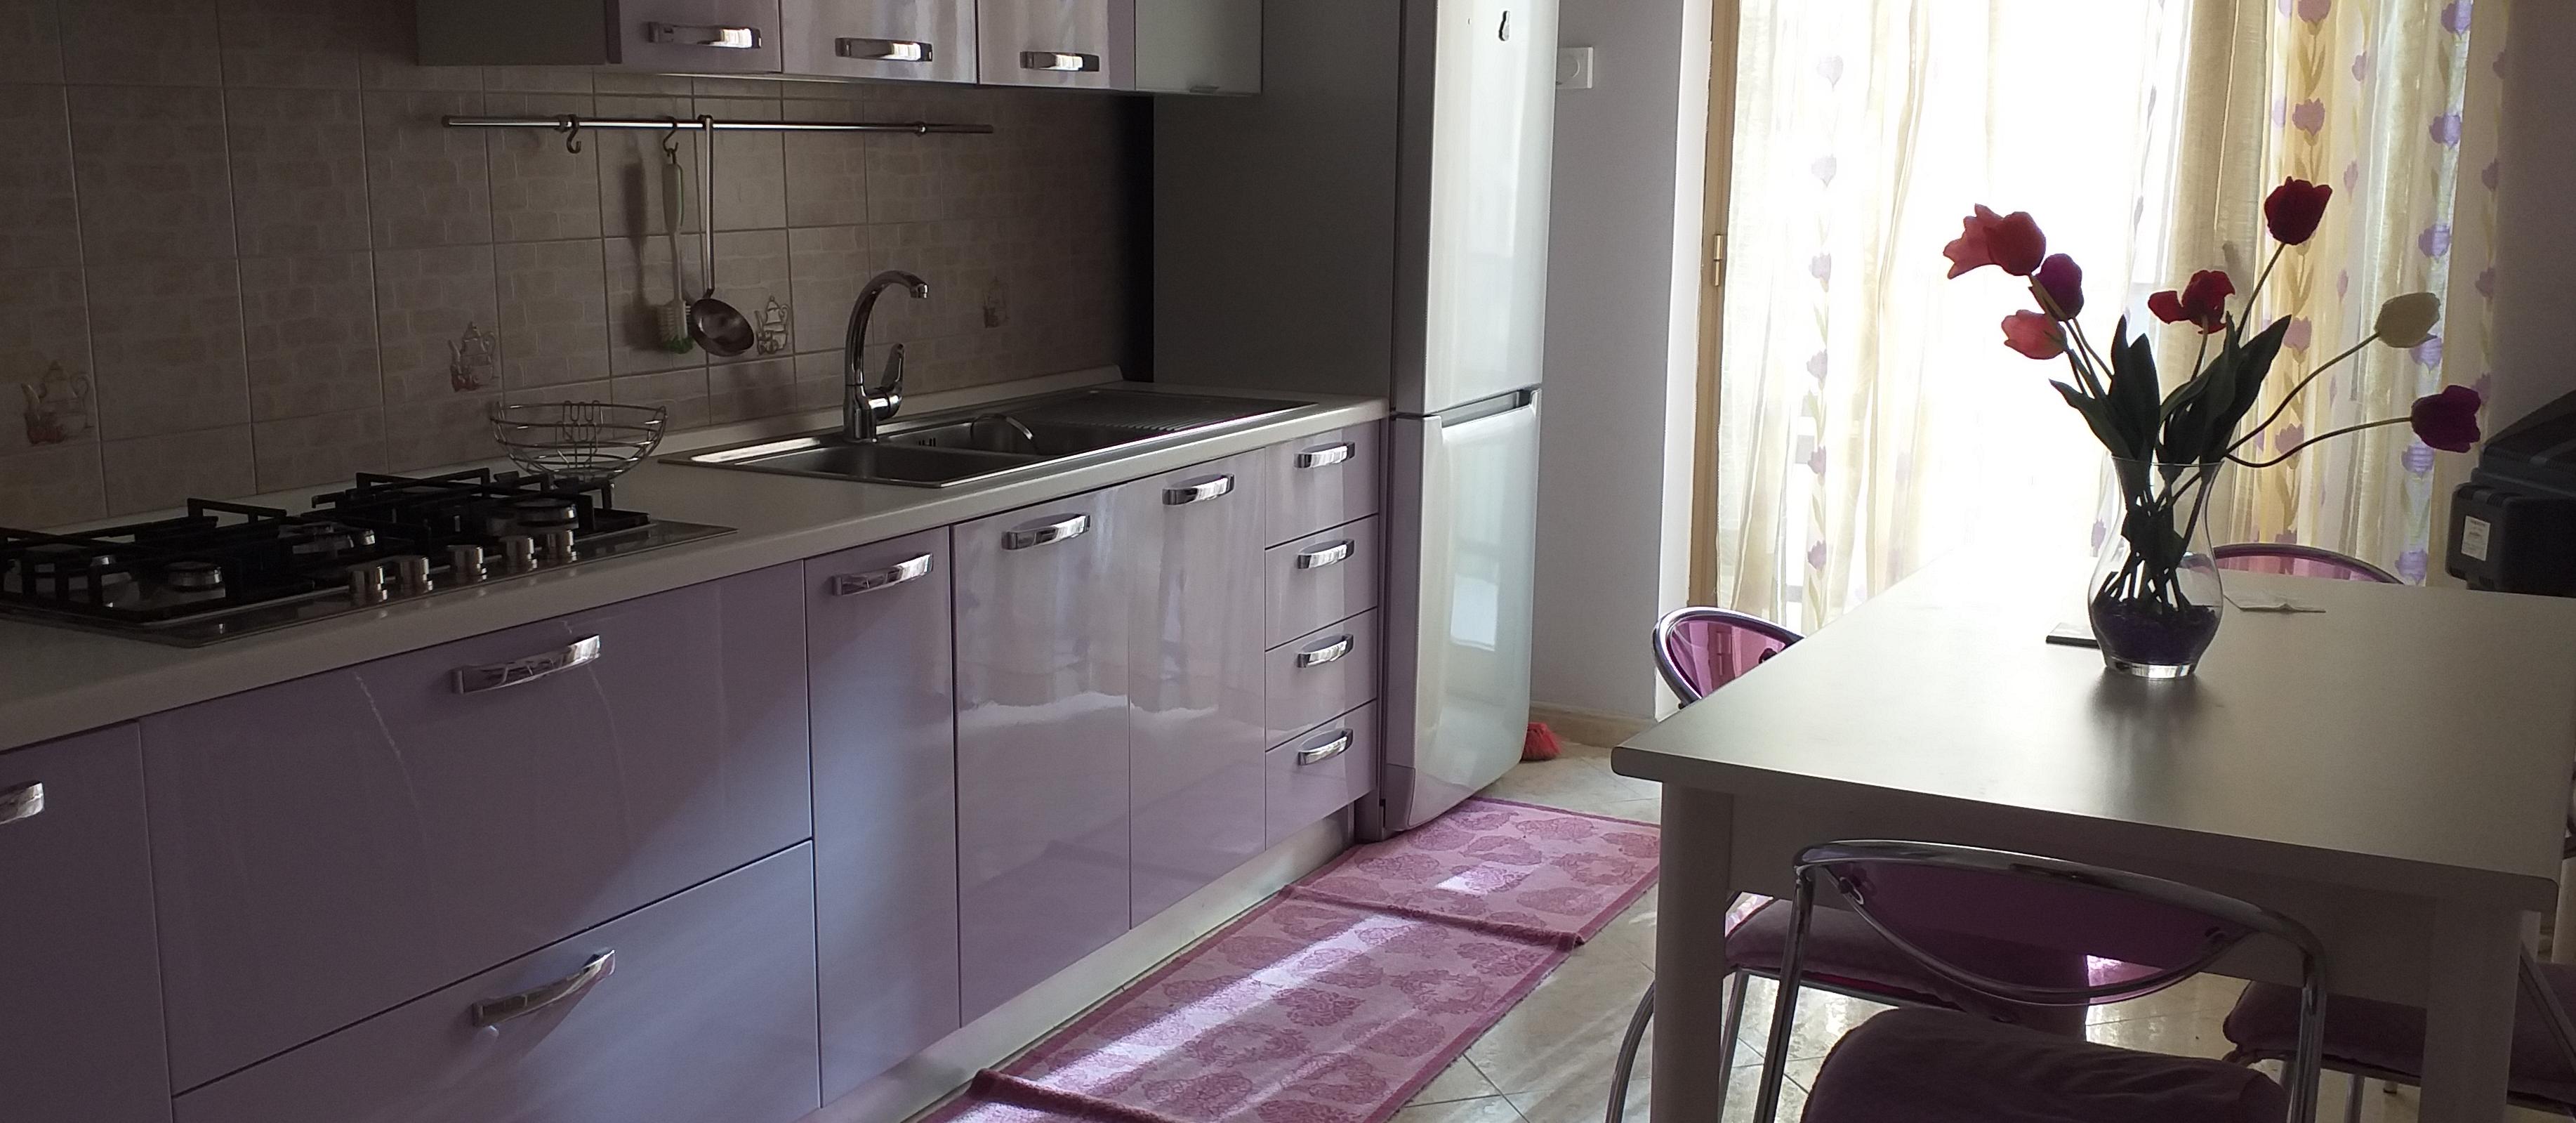 Immobili residenziali a Crotone